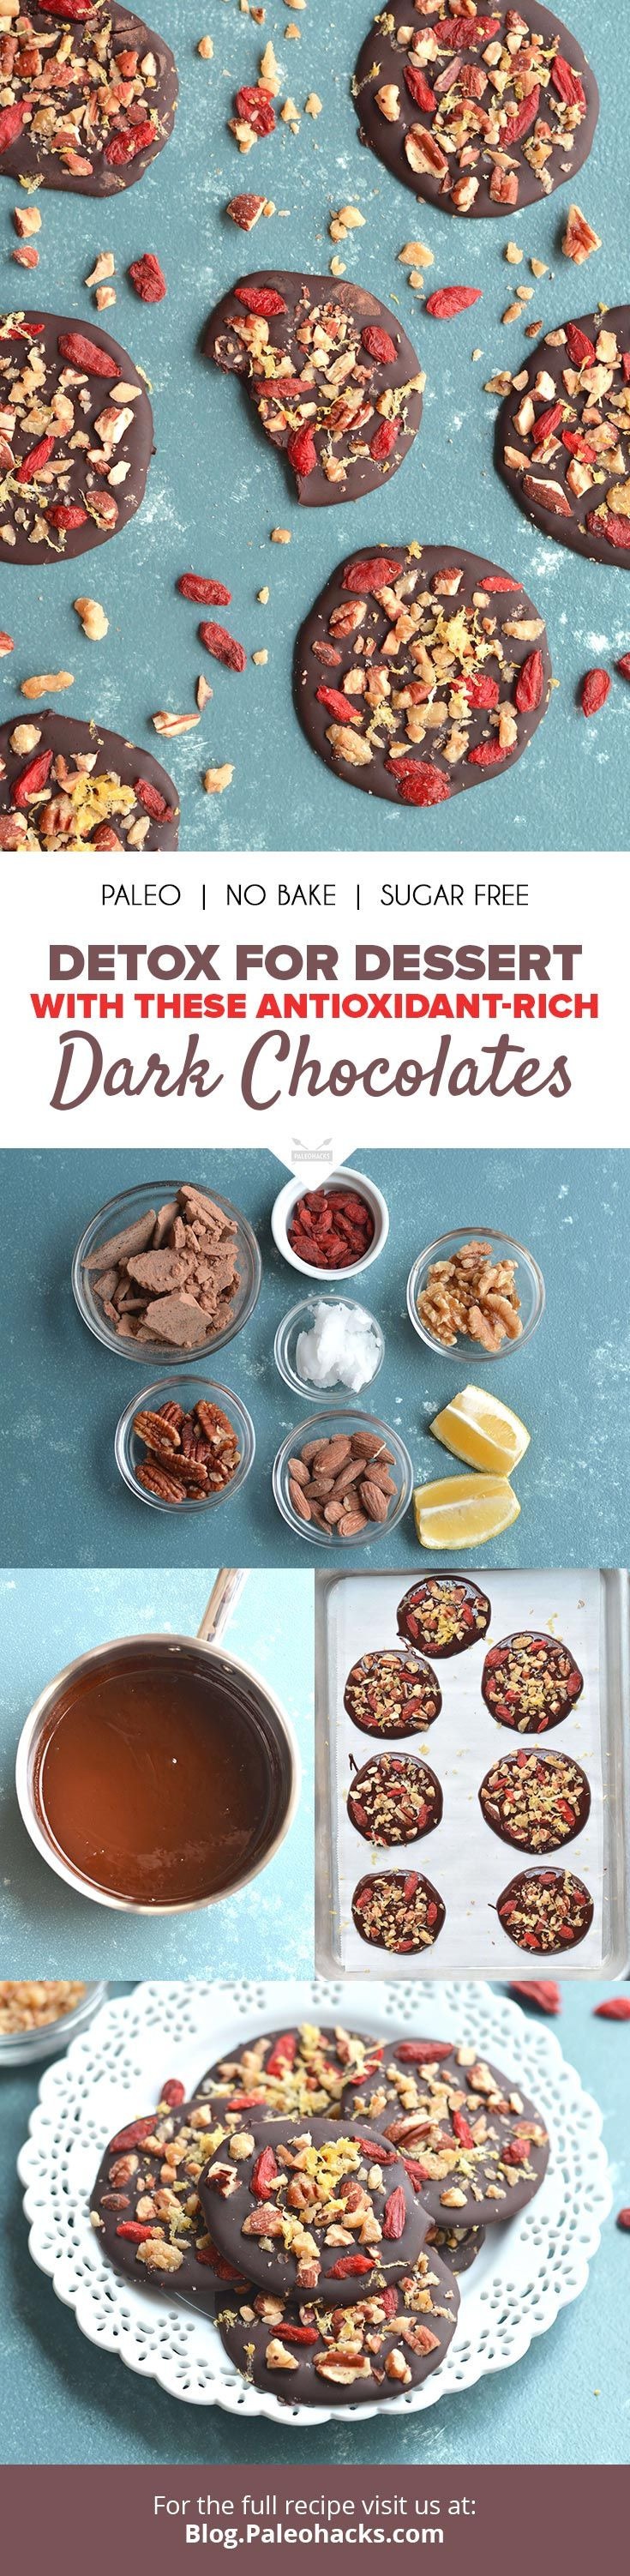 Detox for dessert with these antioxidant-rich dark chocolates! Get the full detox chocolate recipe here: http://paleo.co/antioxidantchoccies